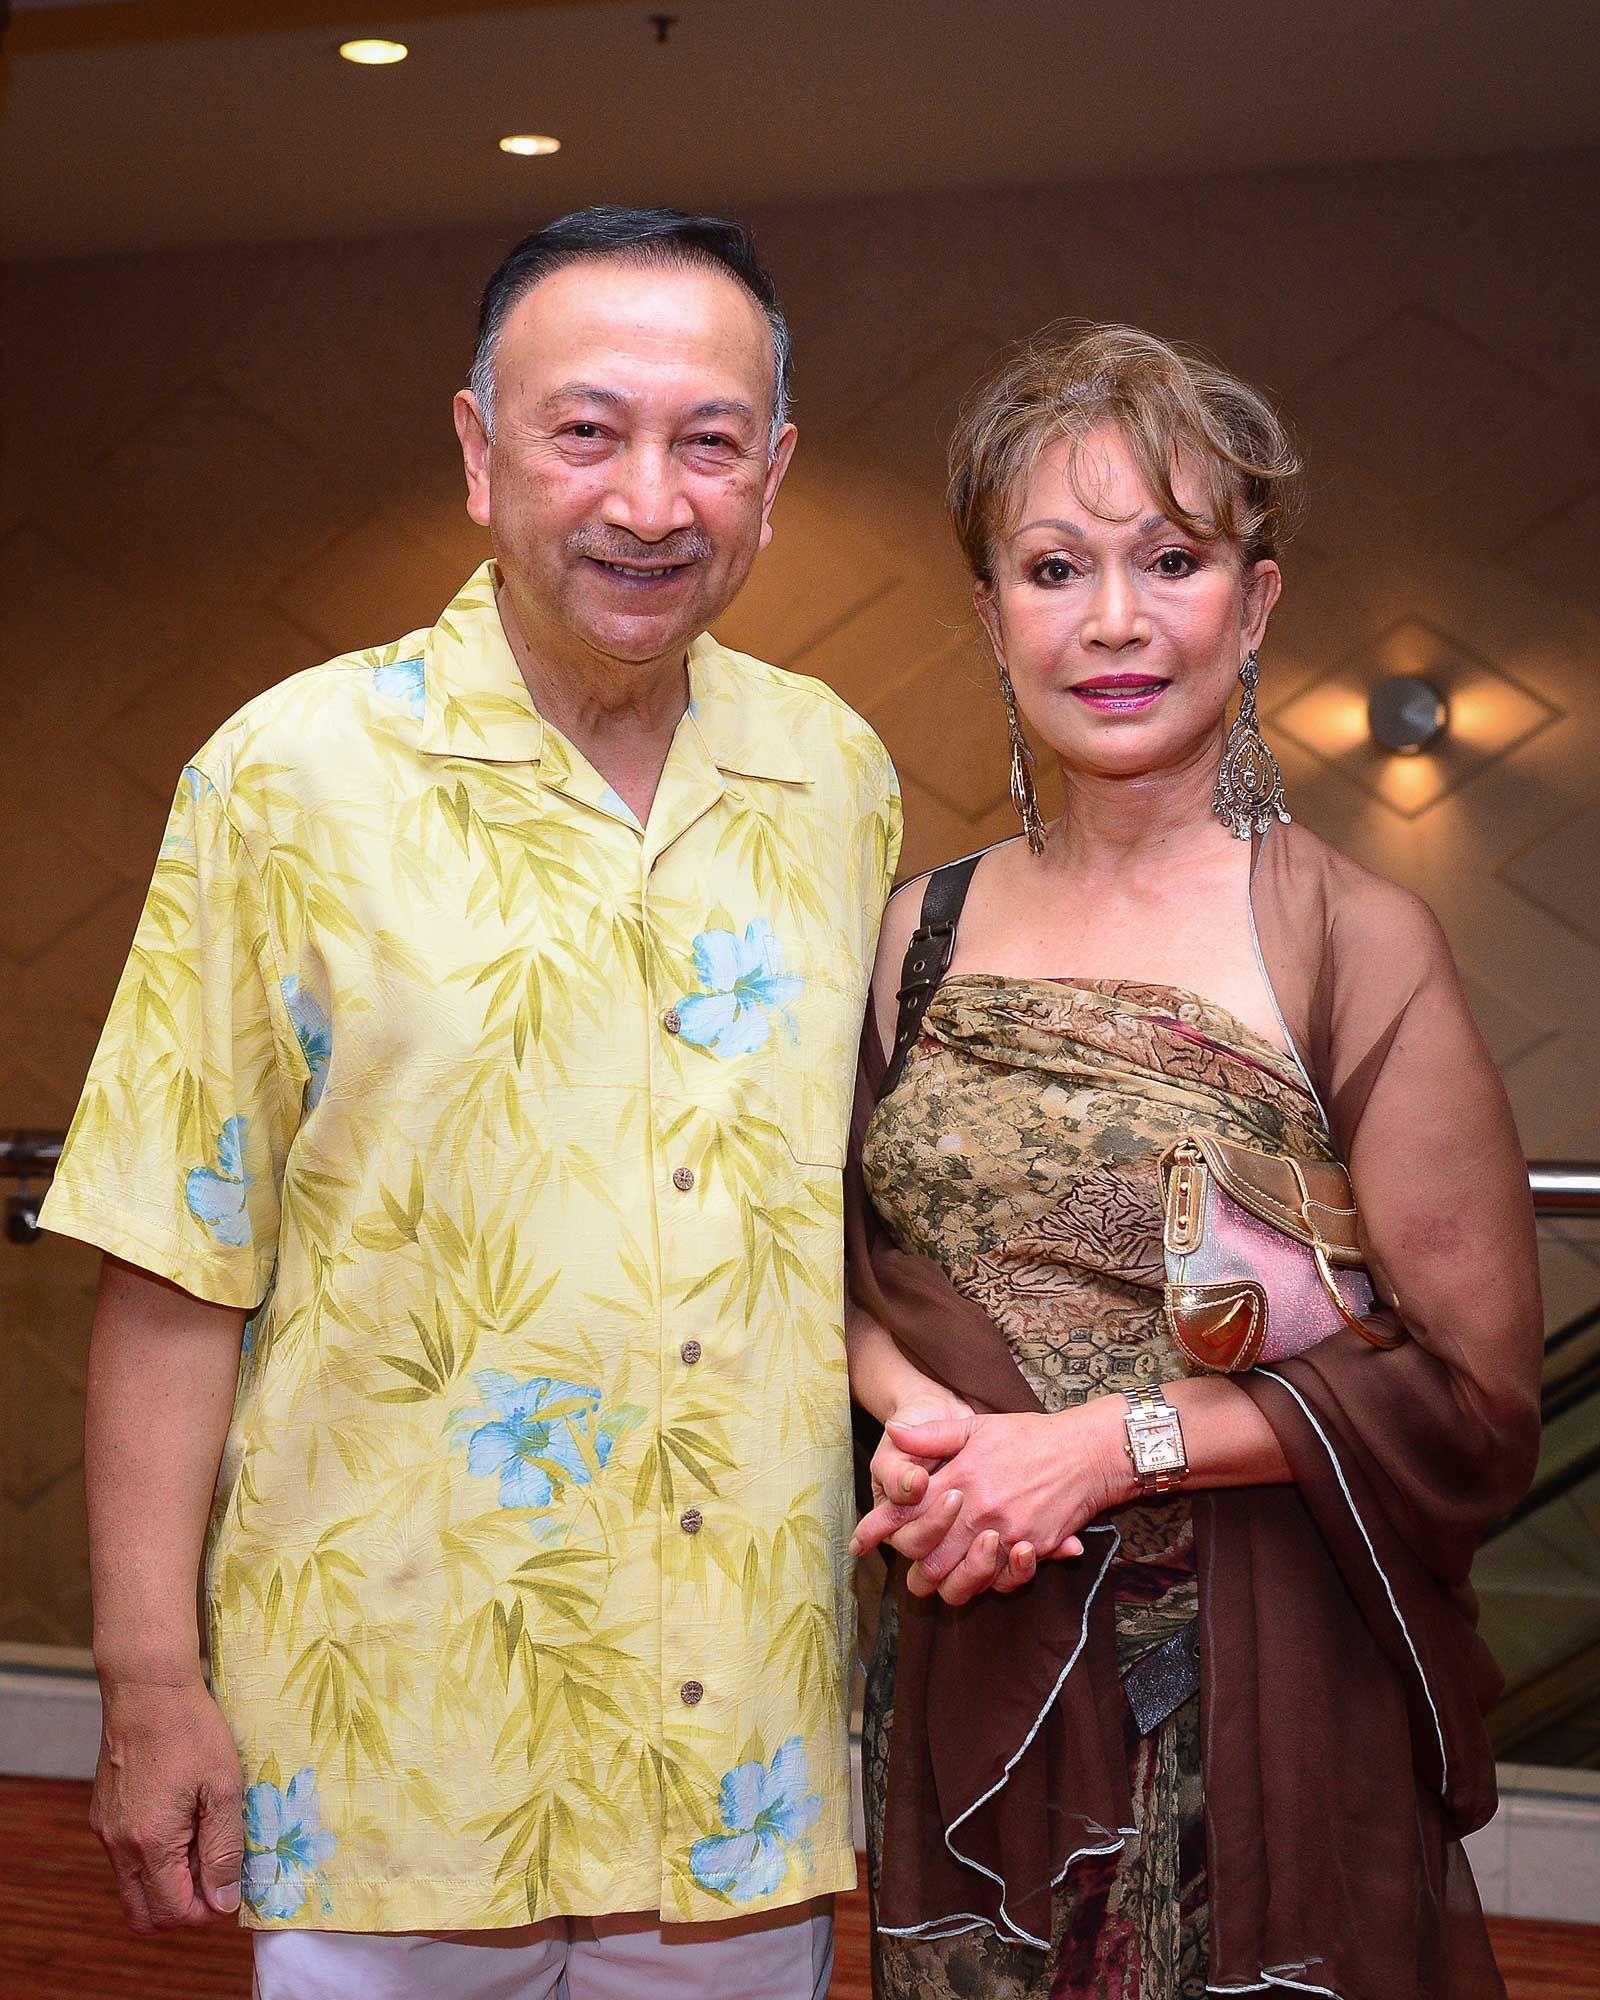 Tunku Dato' Seri Utama Naquiyuddin and Tunku Dato' Seri Nurul Hayati